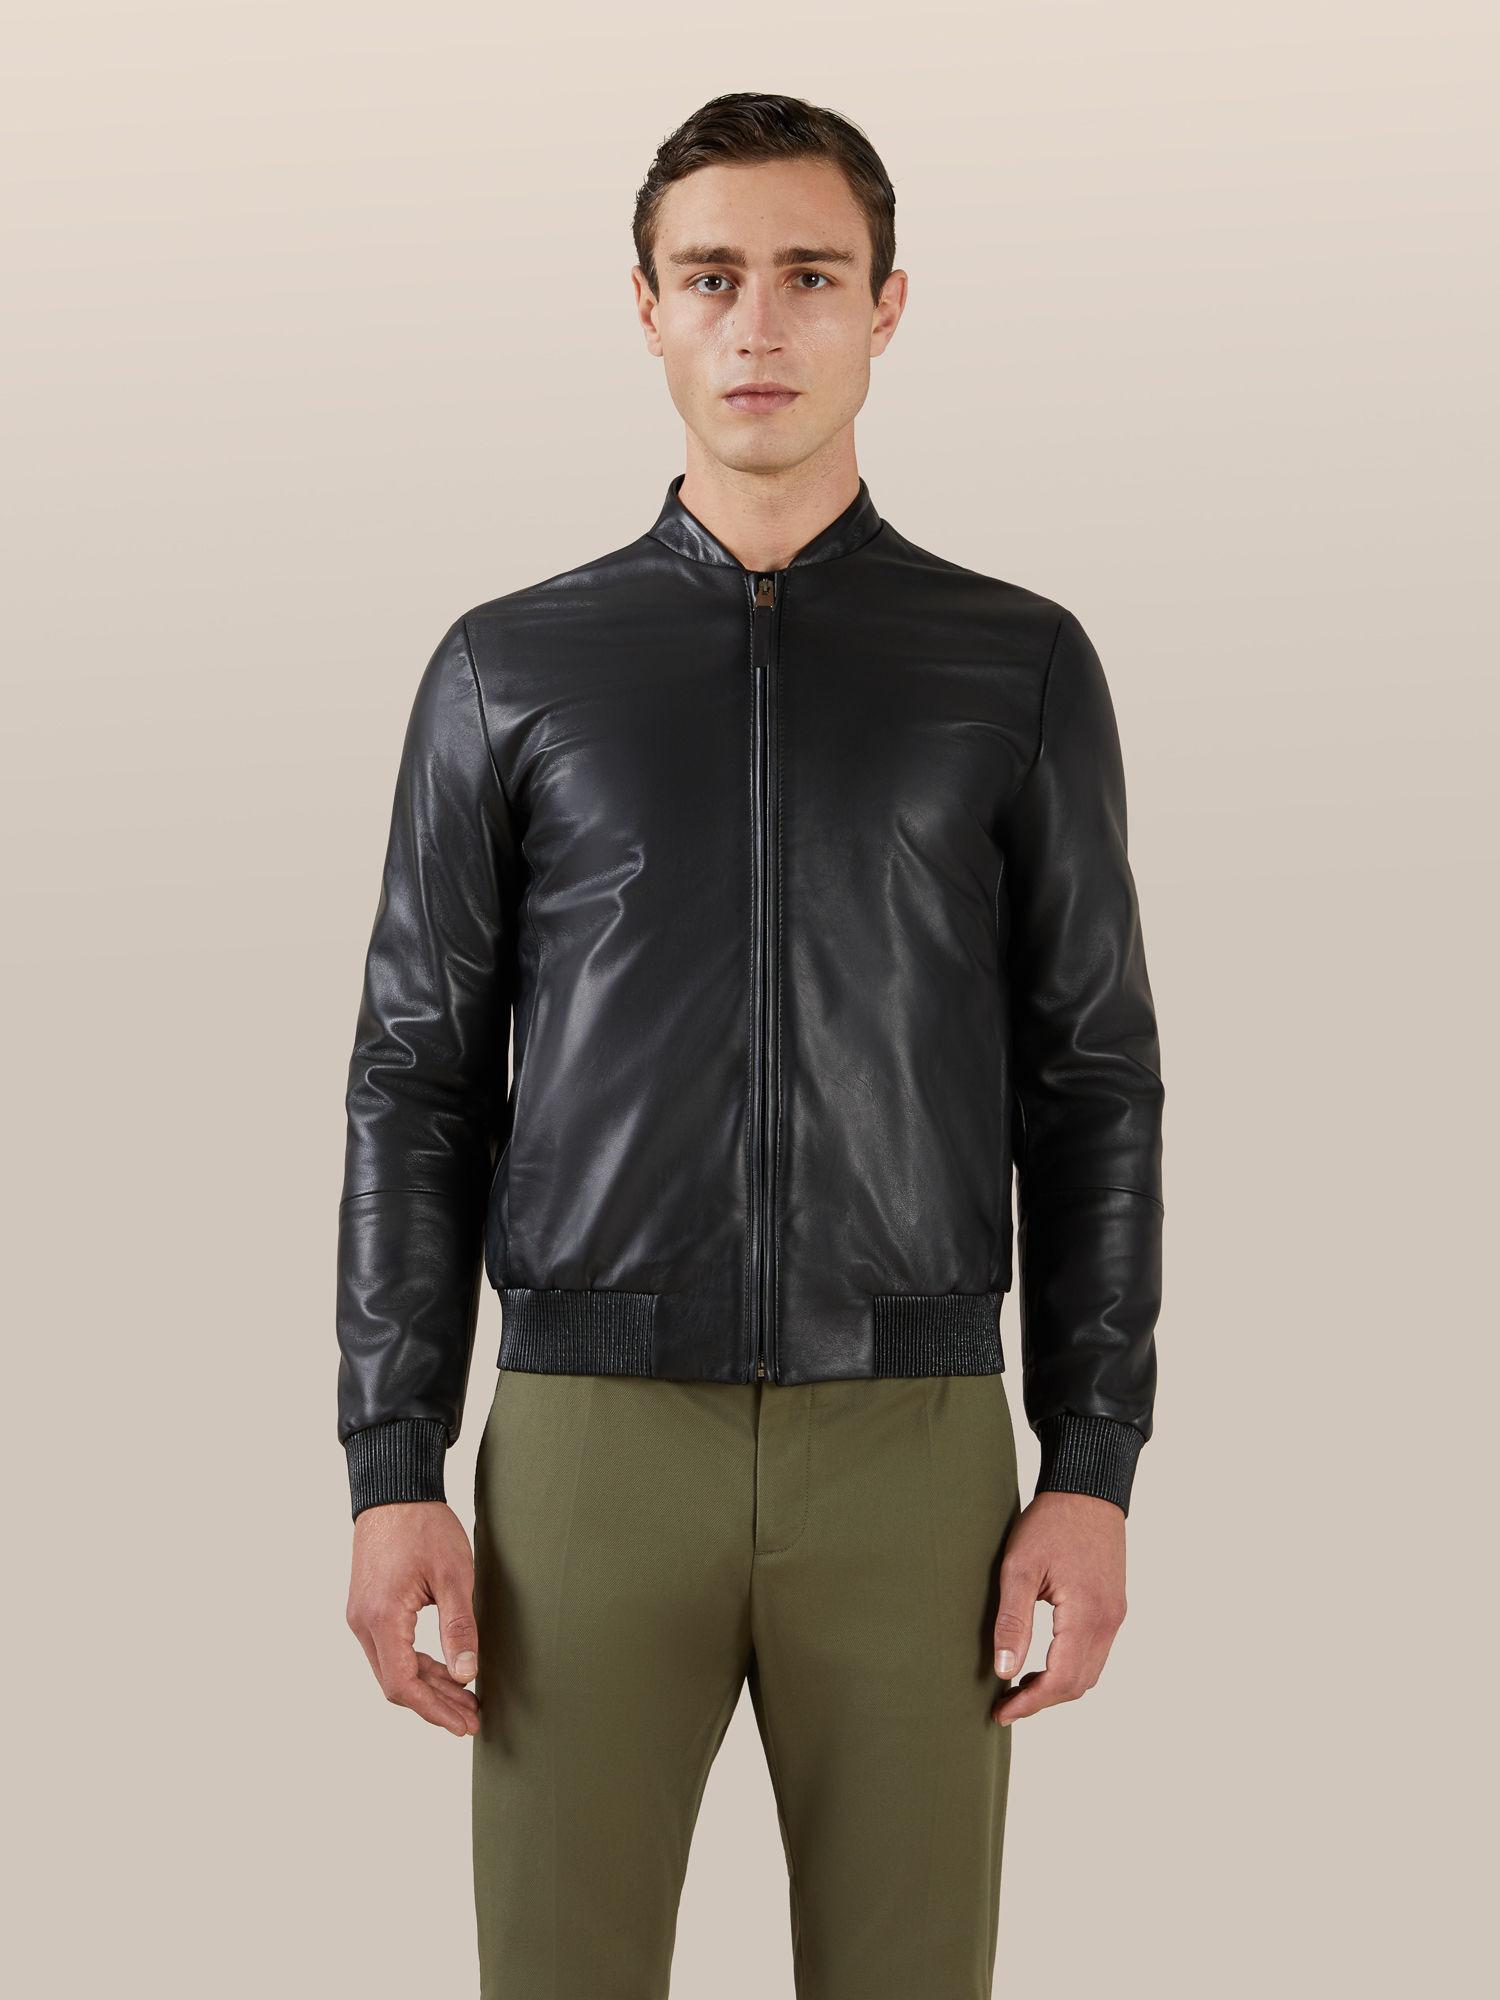 Herrenoberbekleidung | Trussardi ®